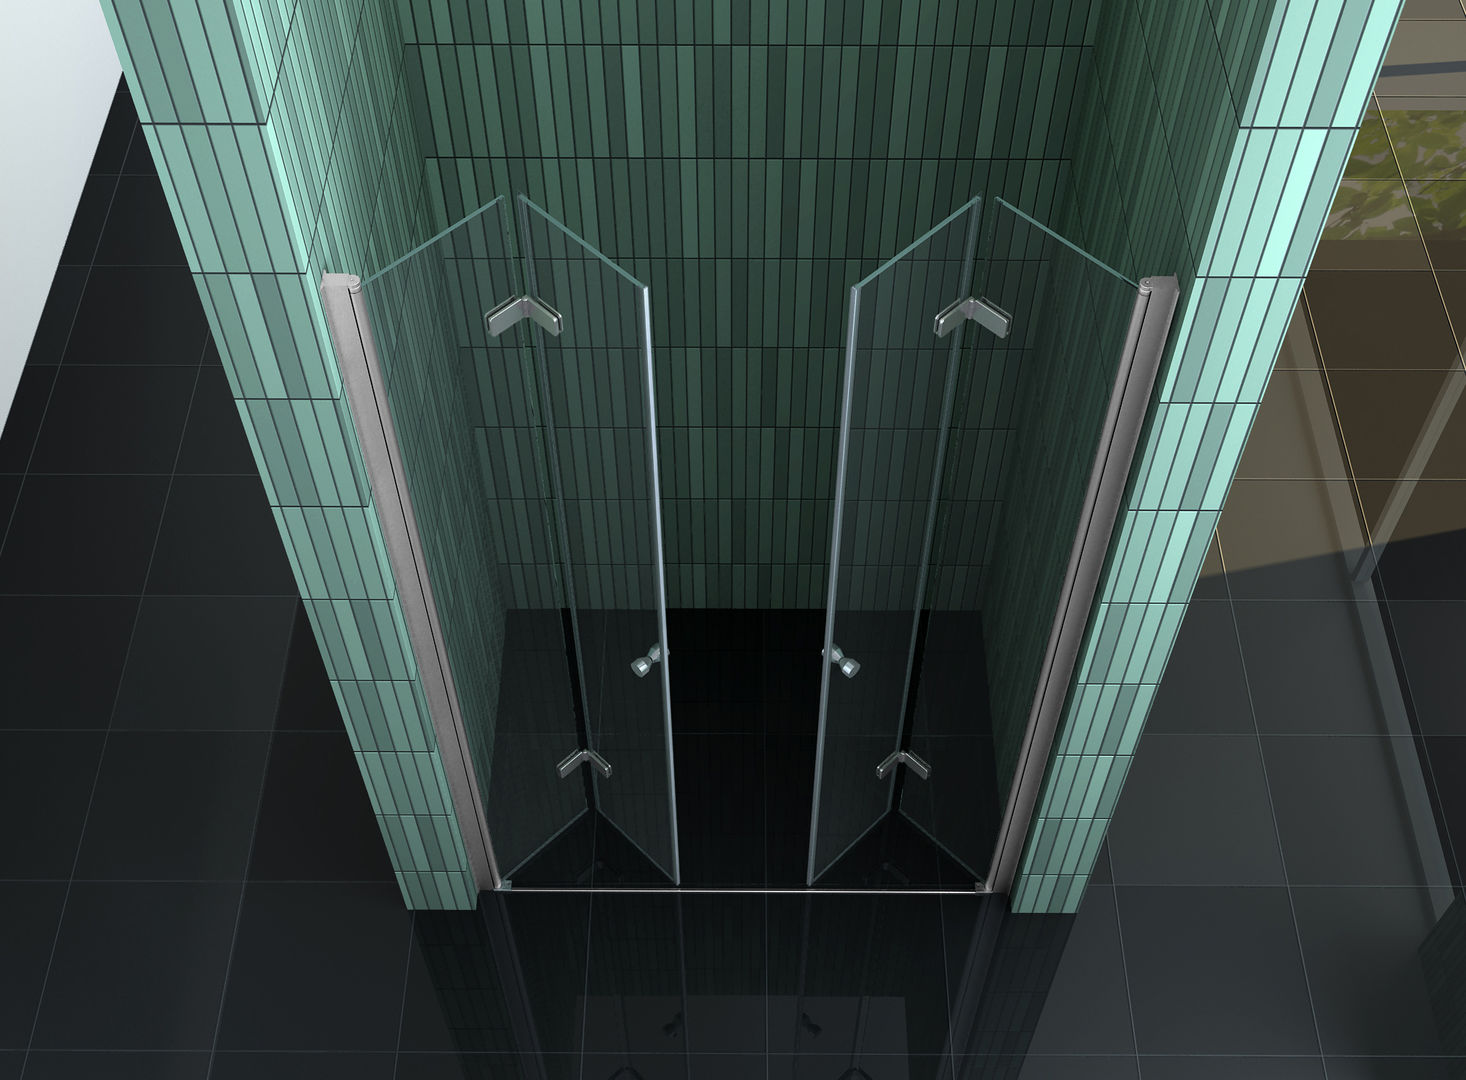 75 140 x 195 cm faltbare nischent r duschwand duscht r. Black Bedroom Furniture Sets. Home Design Ideas